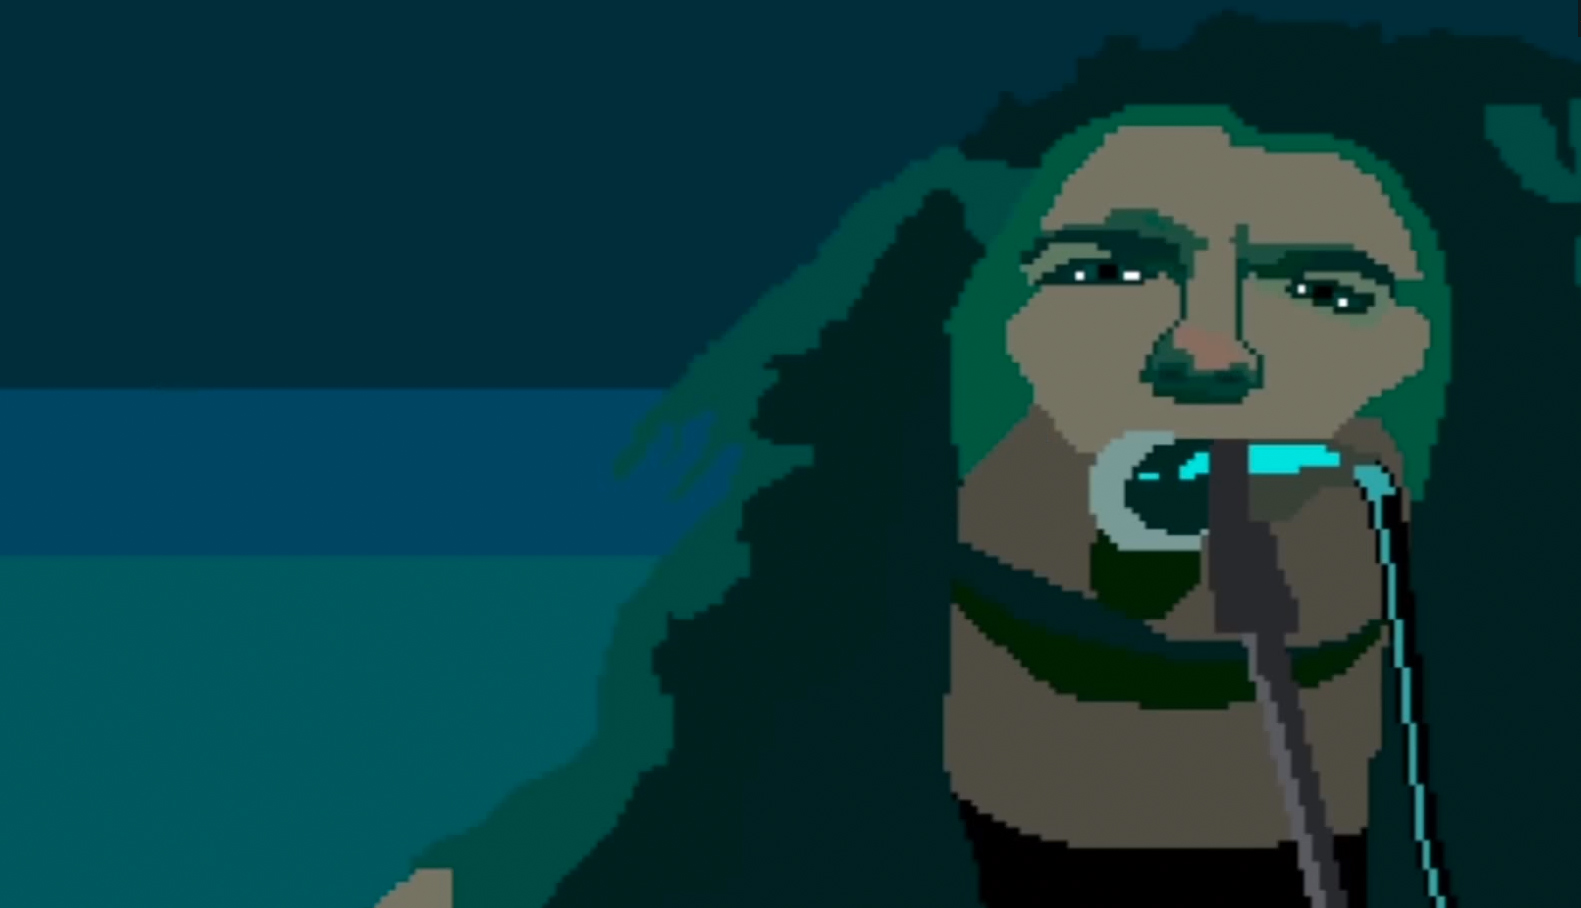 The Big Four -Bit Video Game (Slayer)